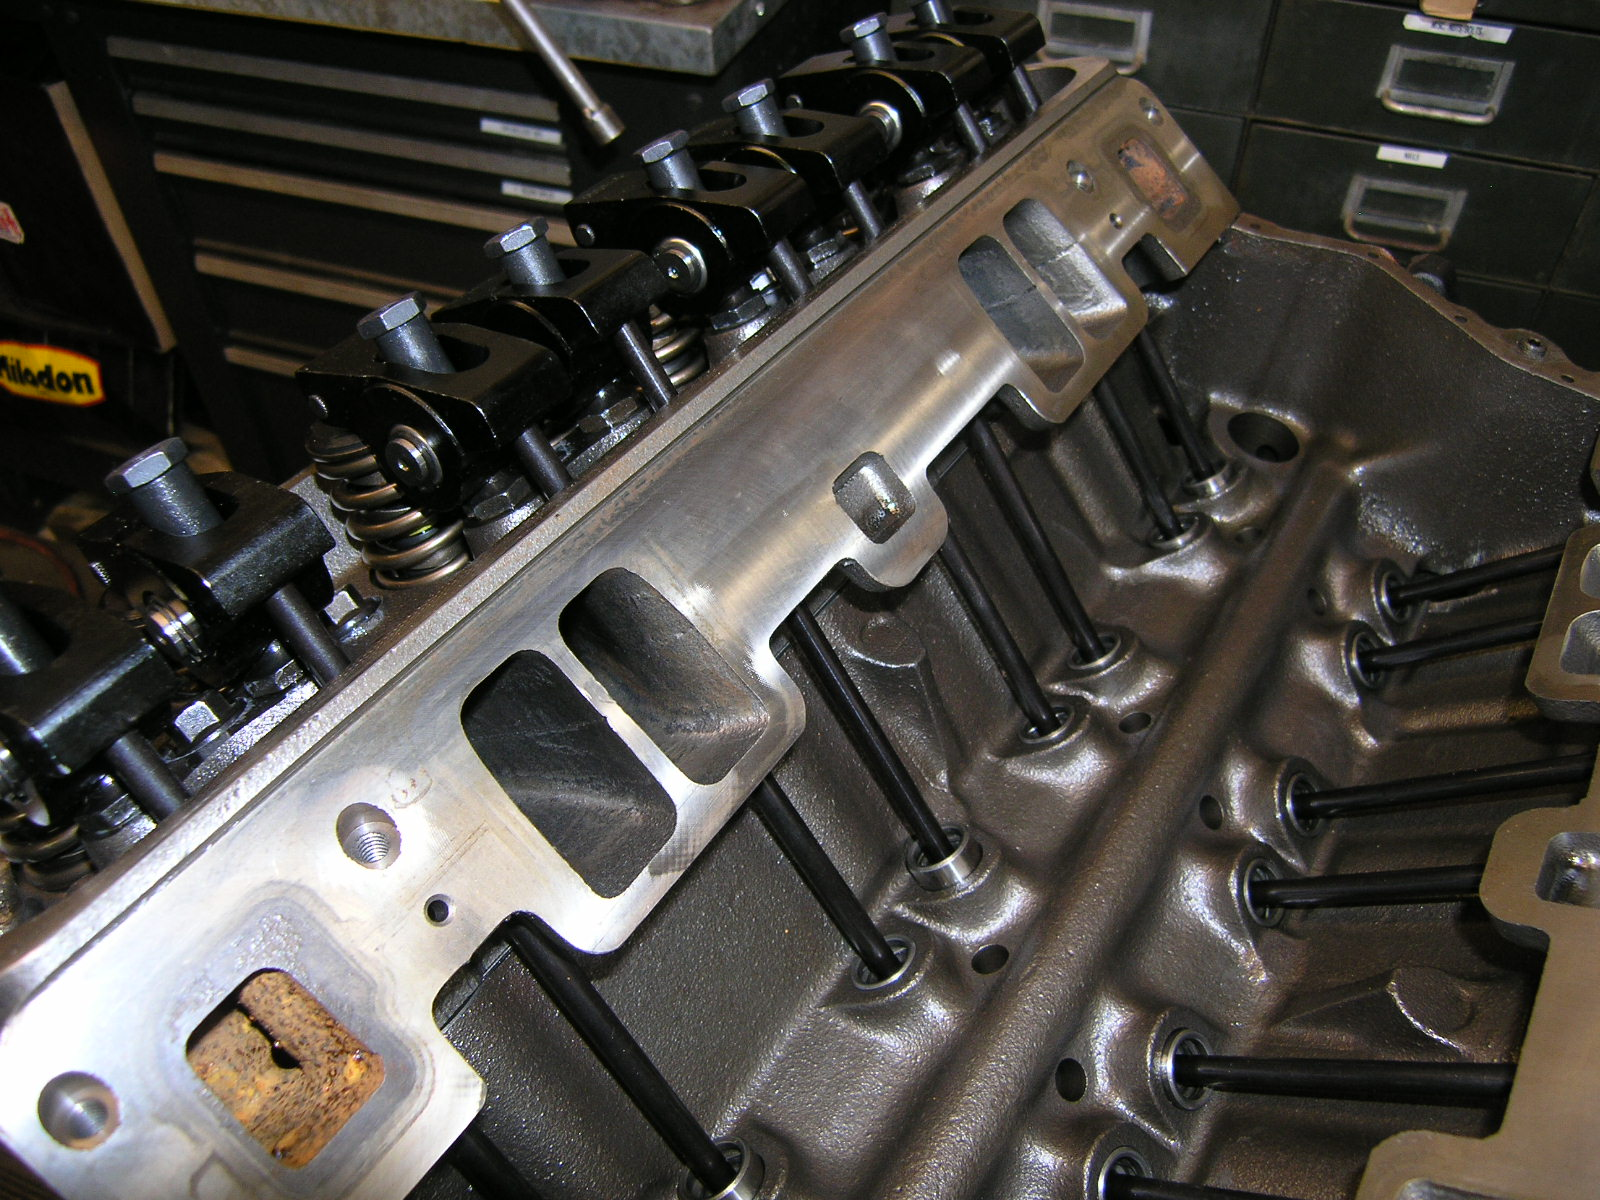 380 Horsepower 460 Ft Lb Torque 383 Small Block Chevy